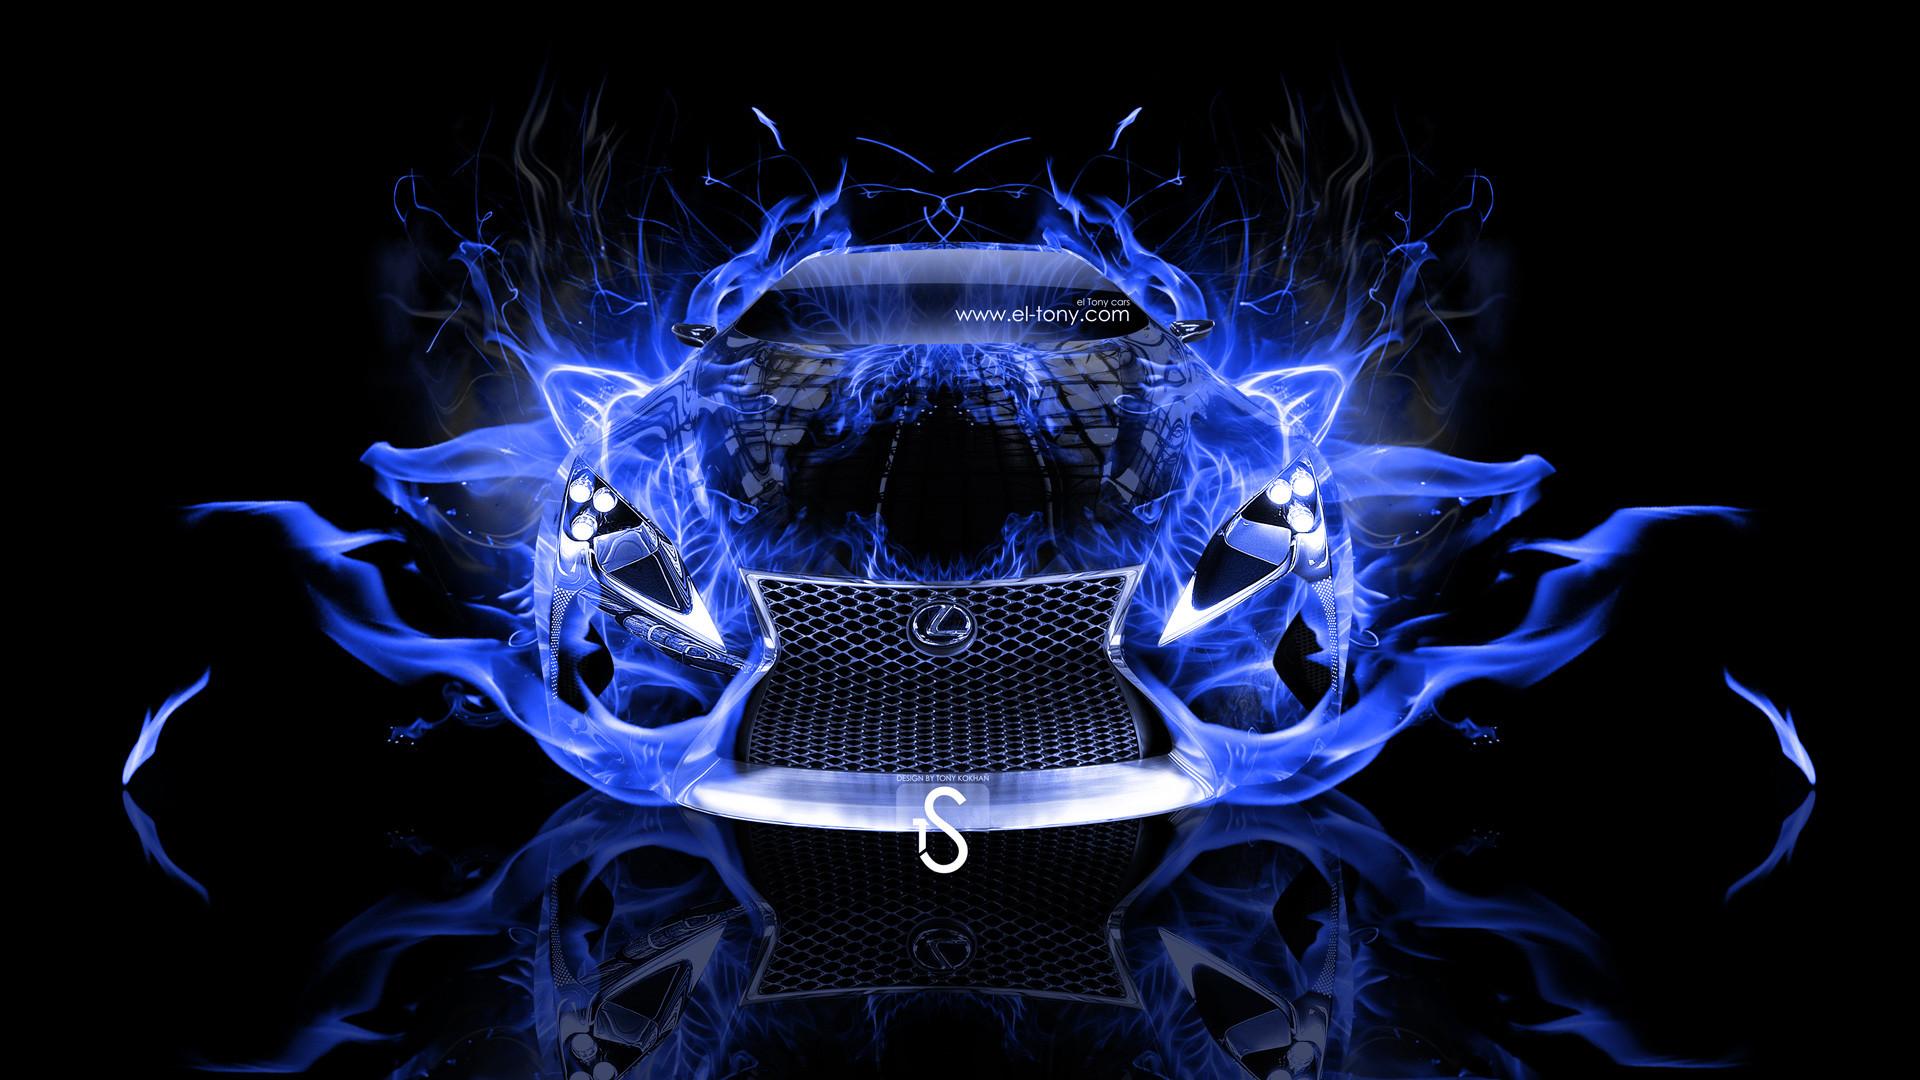 Lexus-LF-LC-Blue-Fire-Abstract-Car-2013-